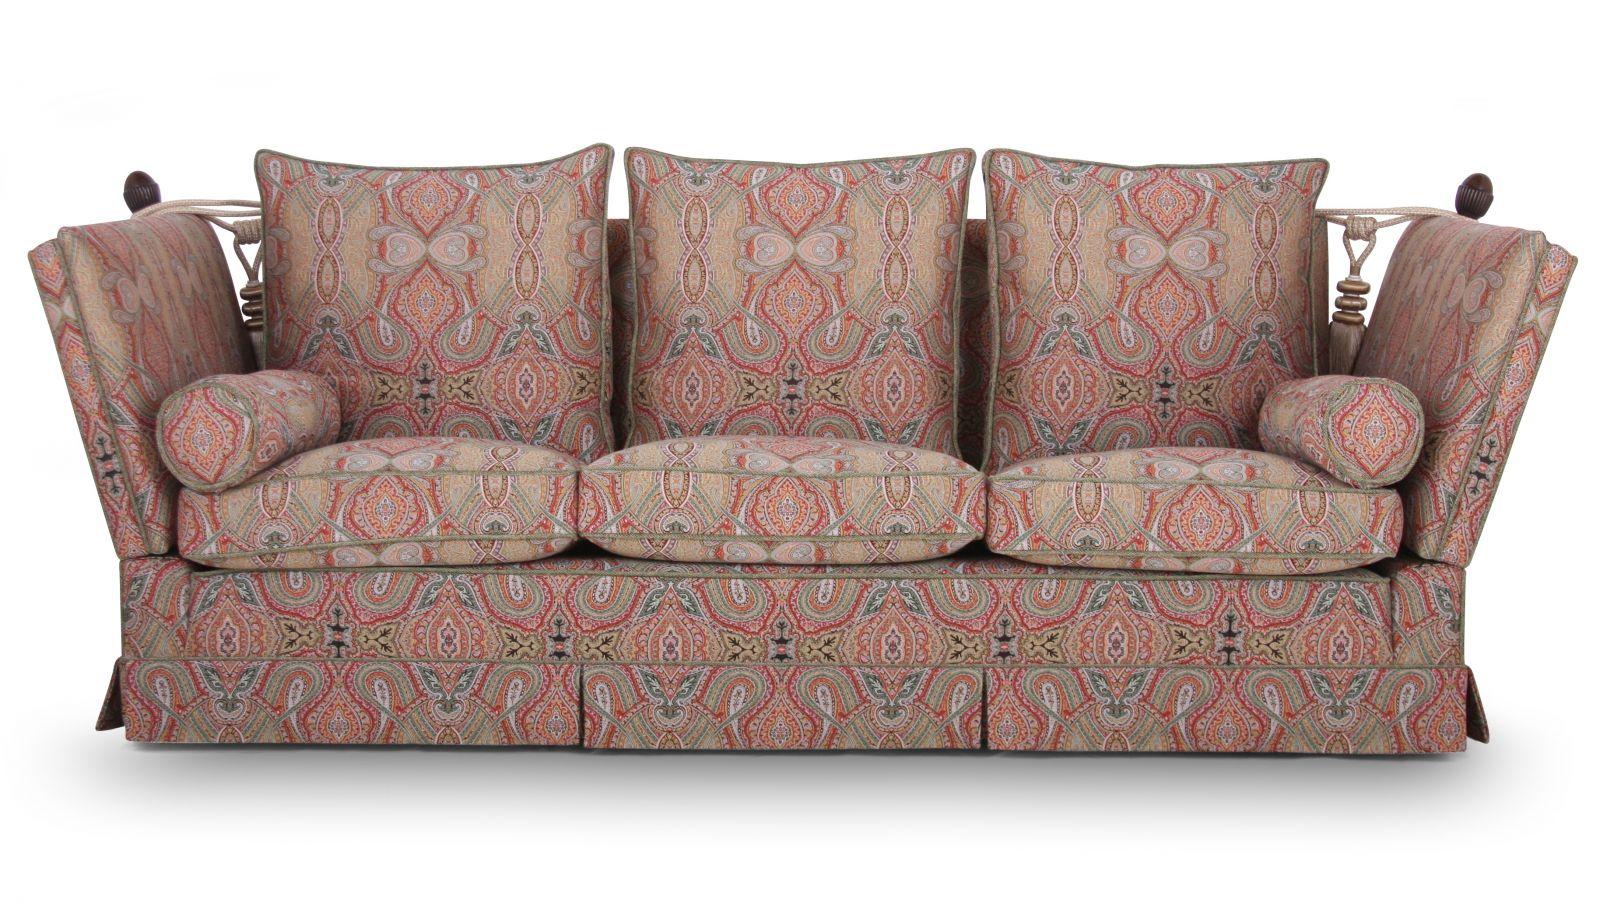 Tudor Knole 3 seat sofa in Zarina Bohemian Green